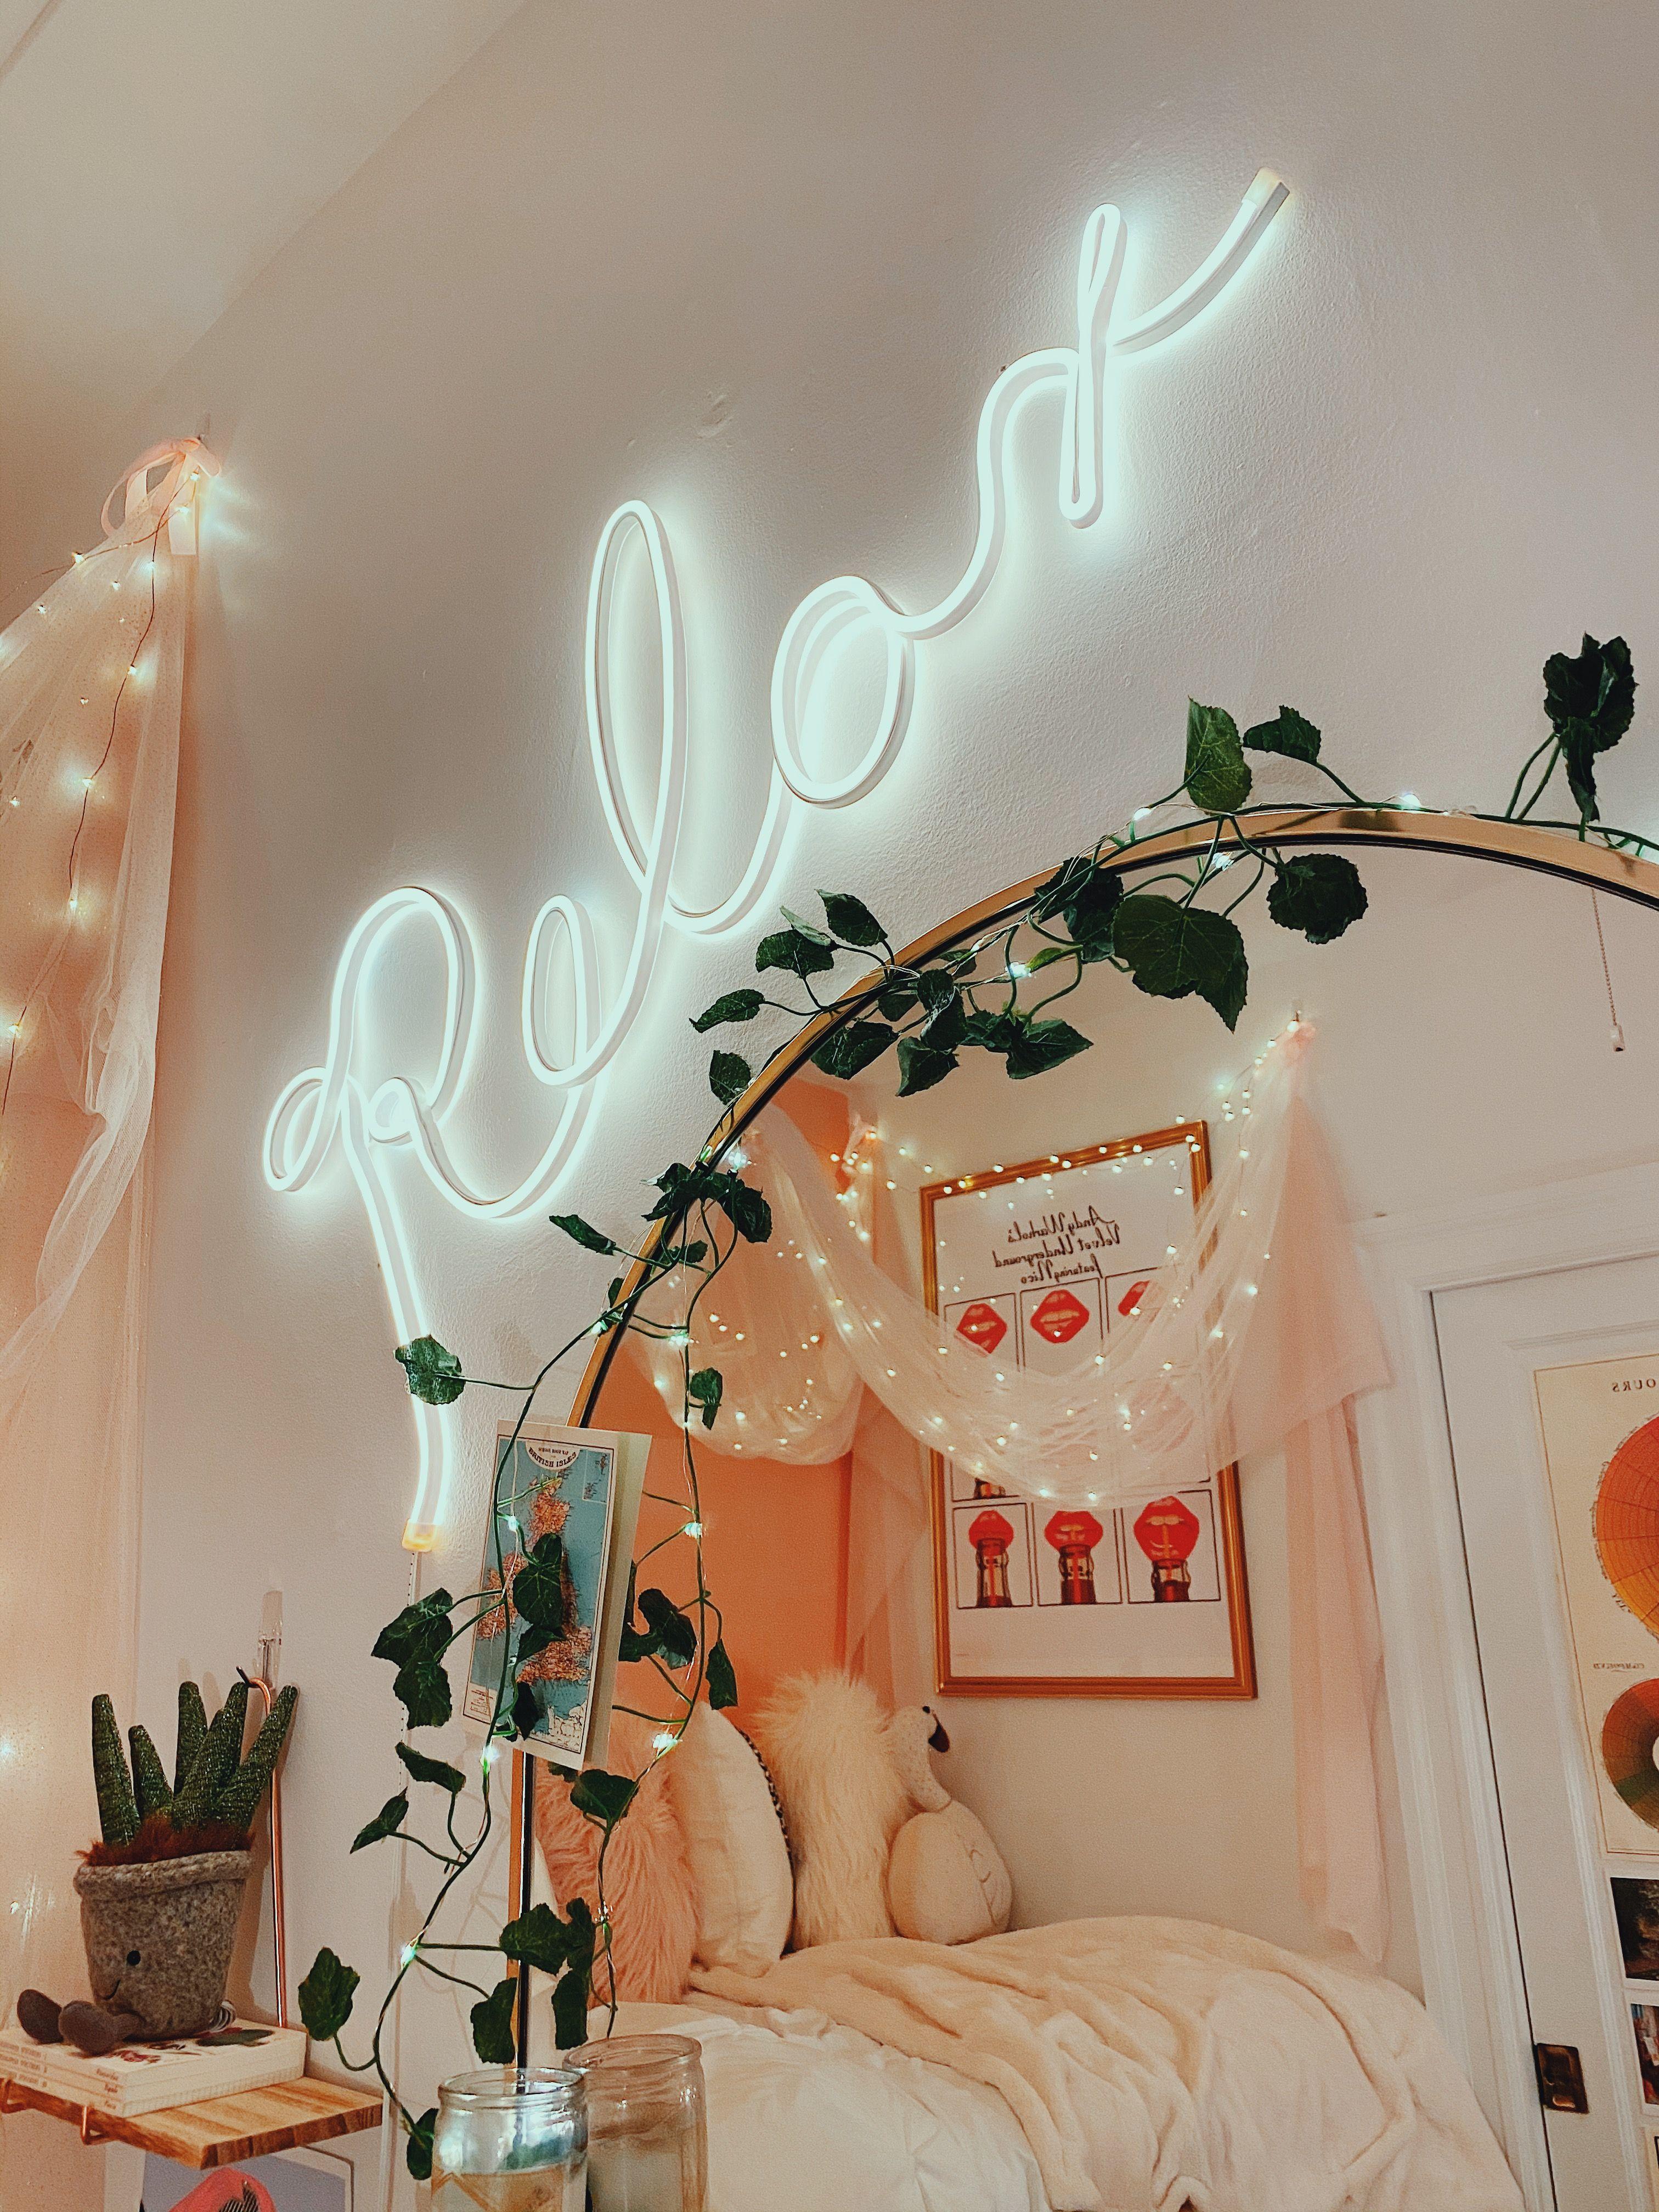 neonsigns pbteen bedroom bedroomideas roomideas dormroomideas aesthetic pink vines on cute lights for bedroom decorating ideas id=15999